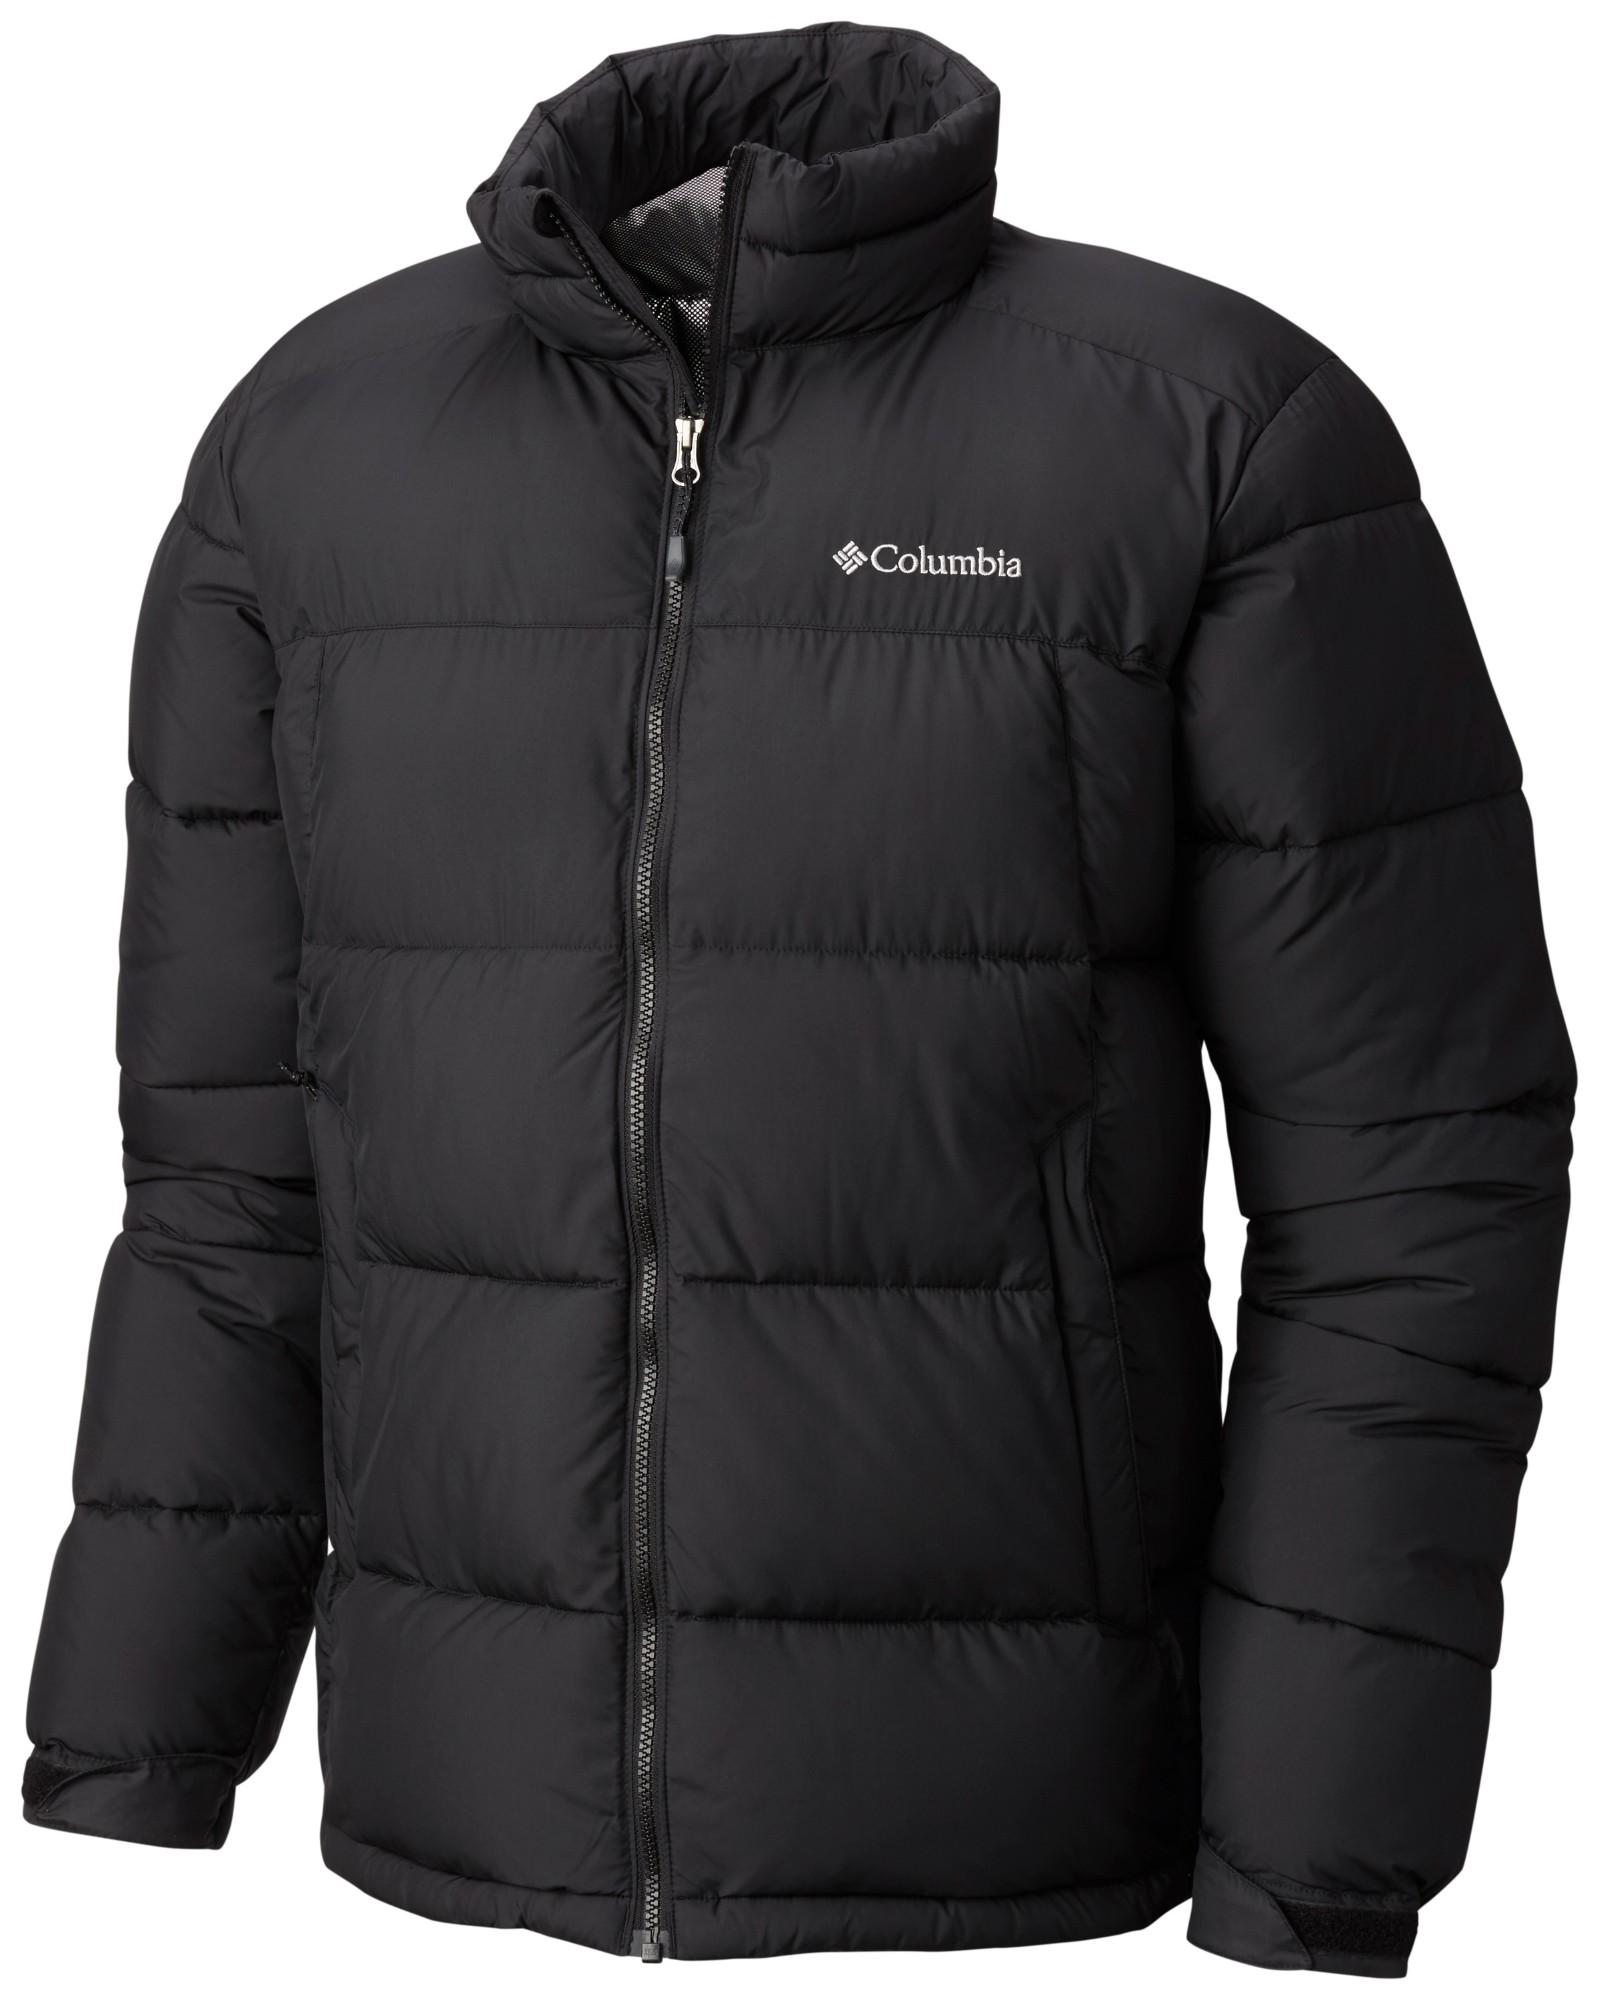 Columbia Pike Lake Jacket Black XL